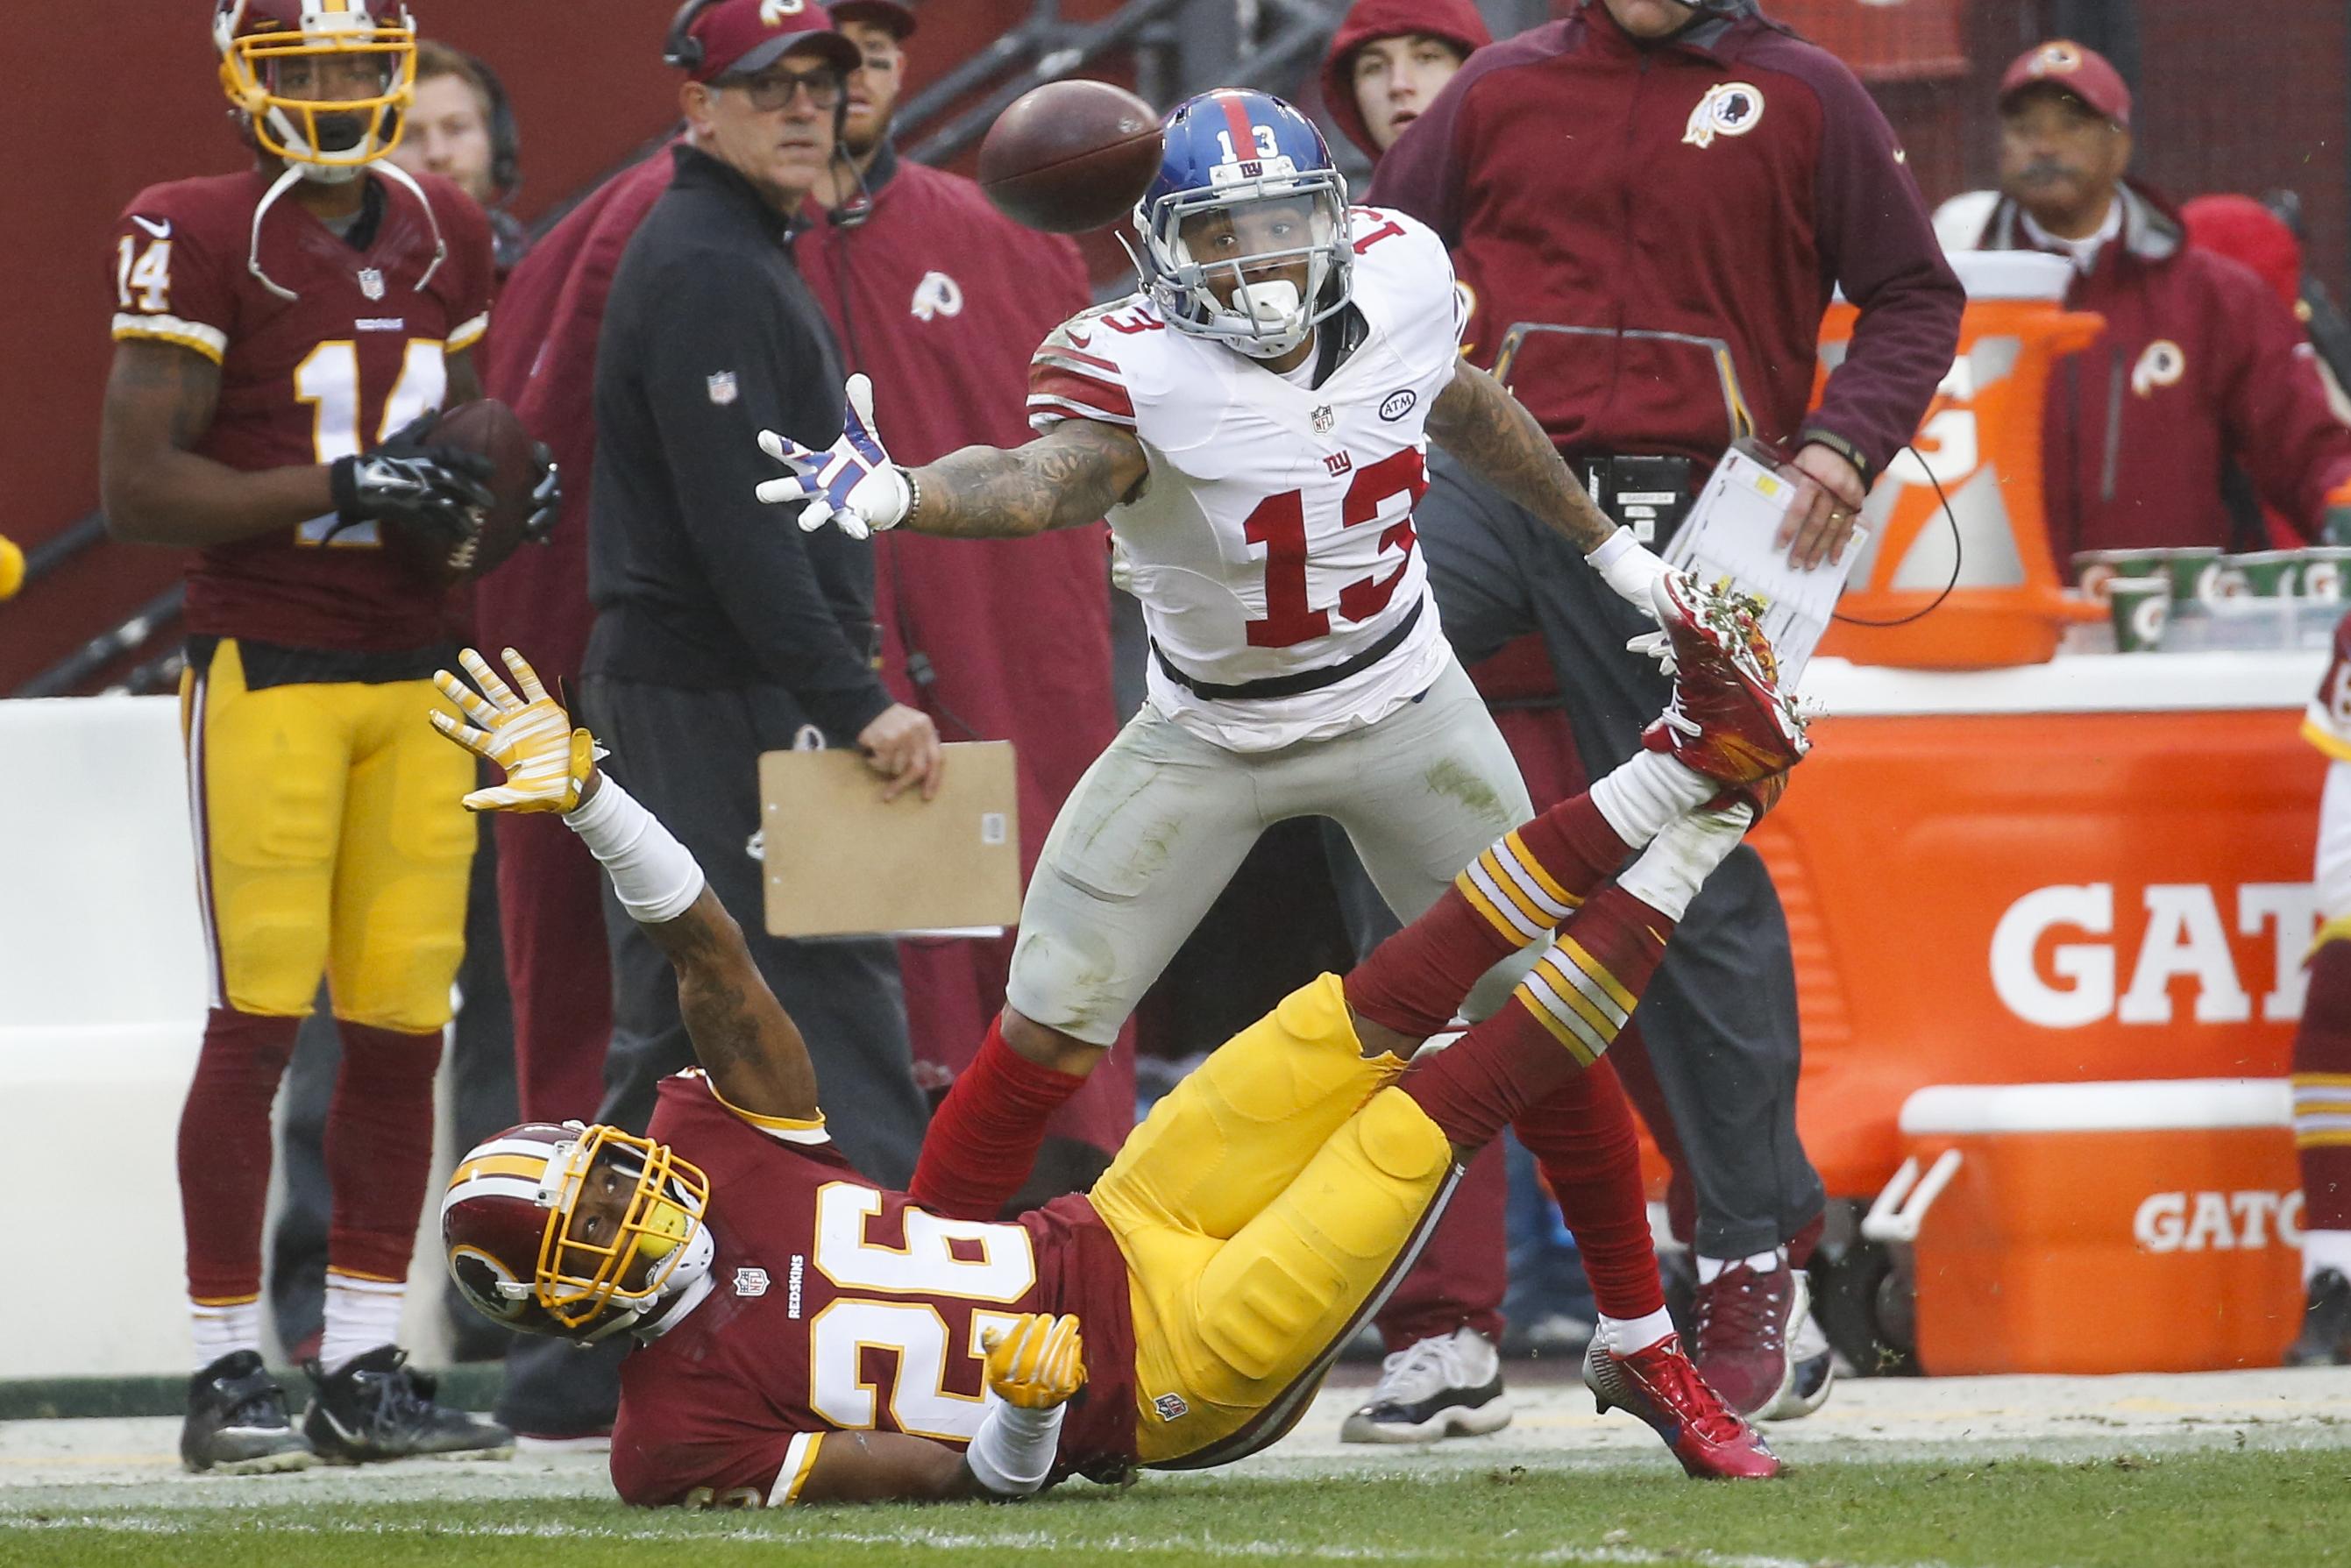 Nike NFL Jerseys - Quinton Dunbar - Bio, News, Photos - Washington Times